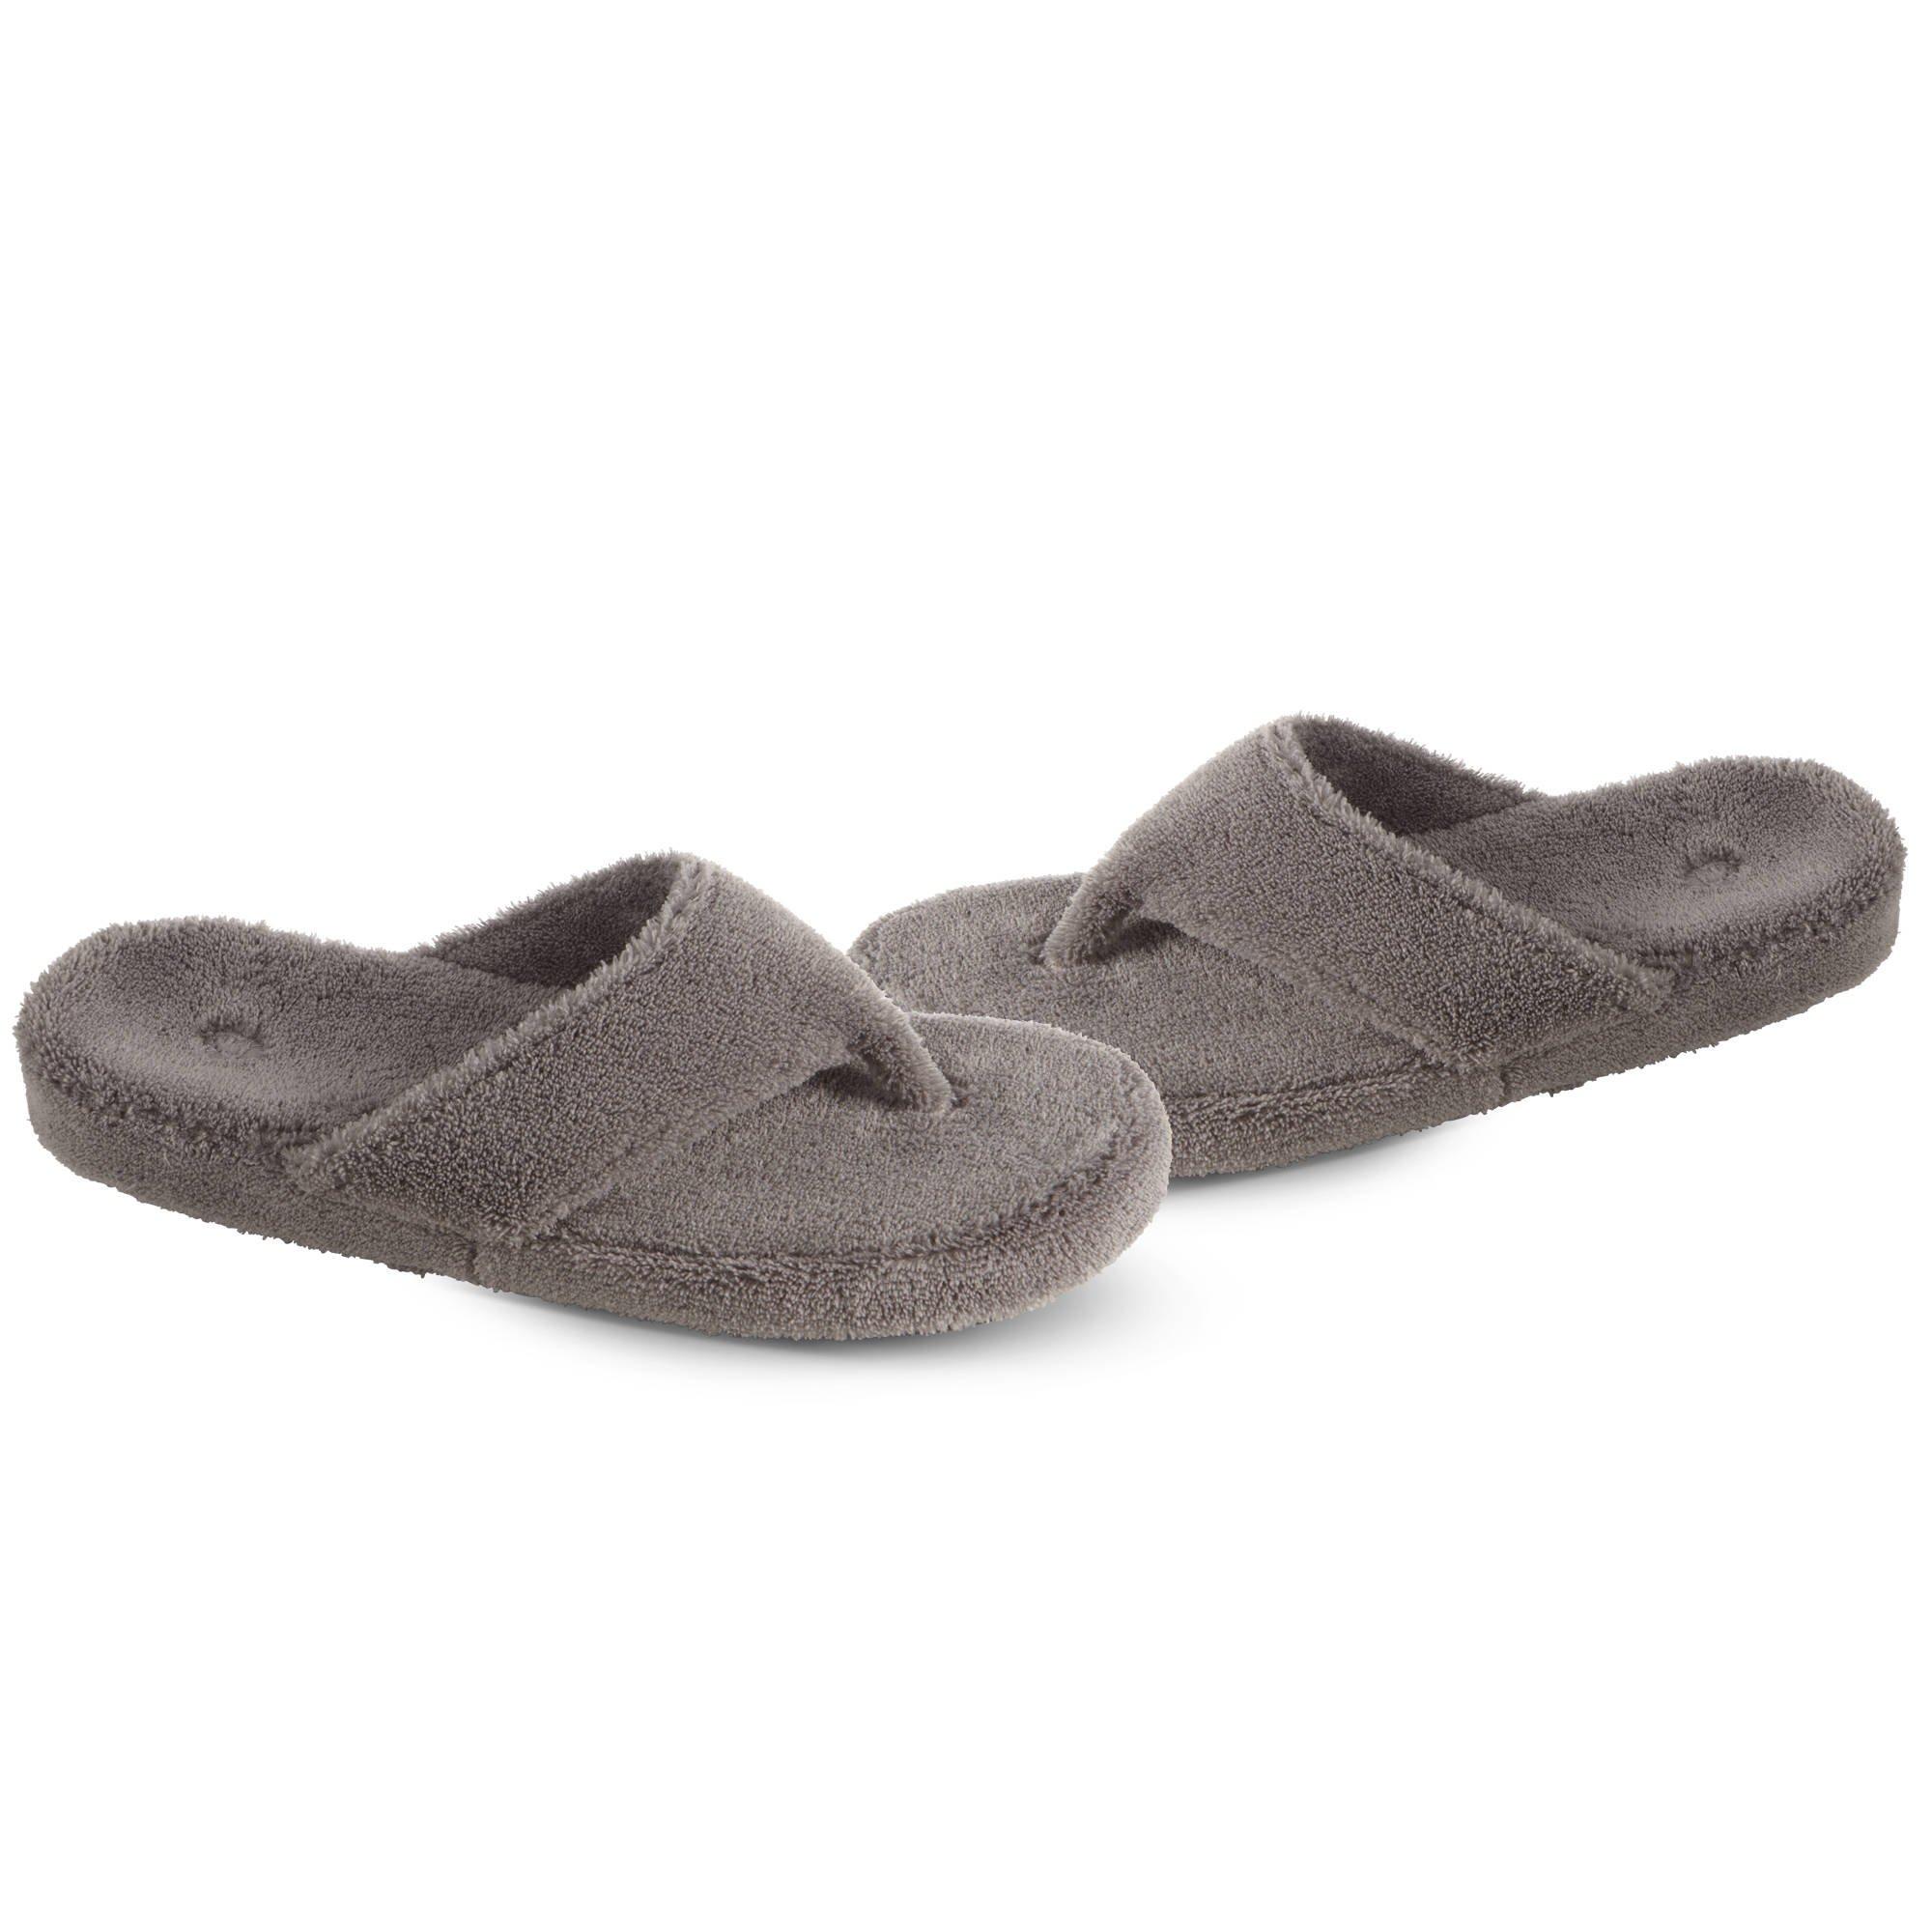 Acorn Women's Spa Thong Slippers Grey XL Wide